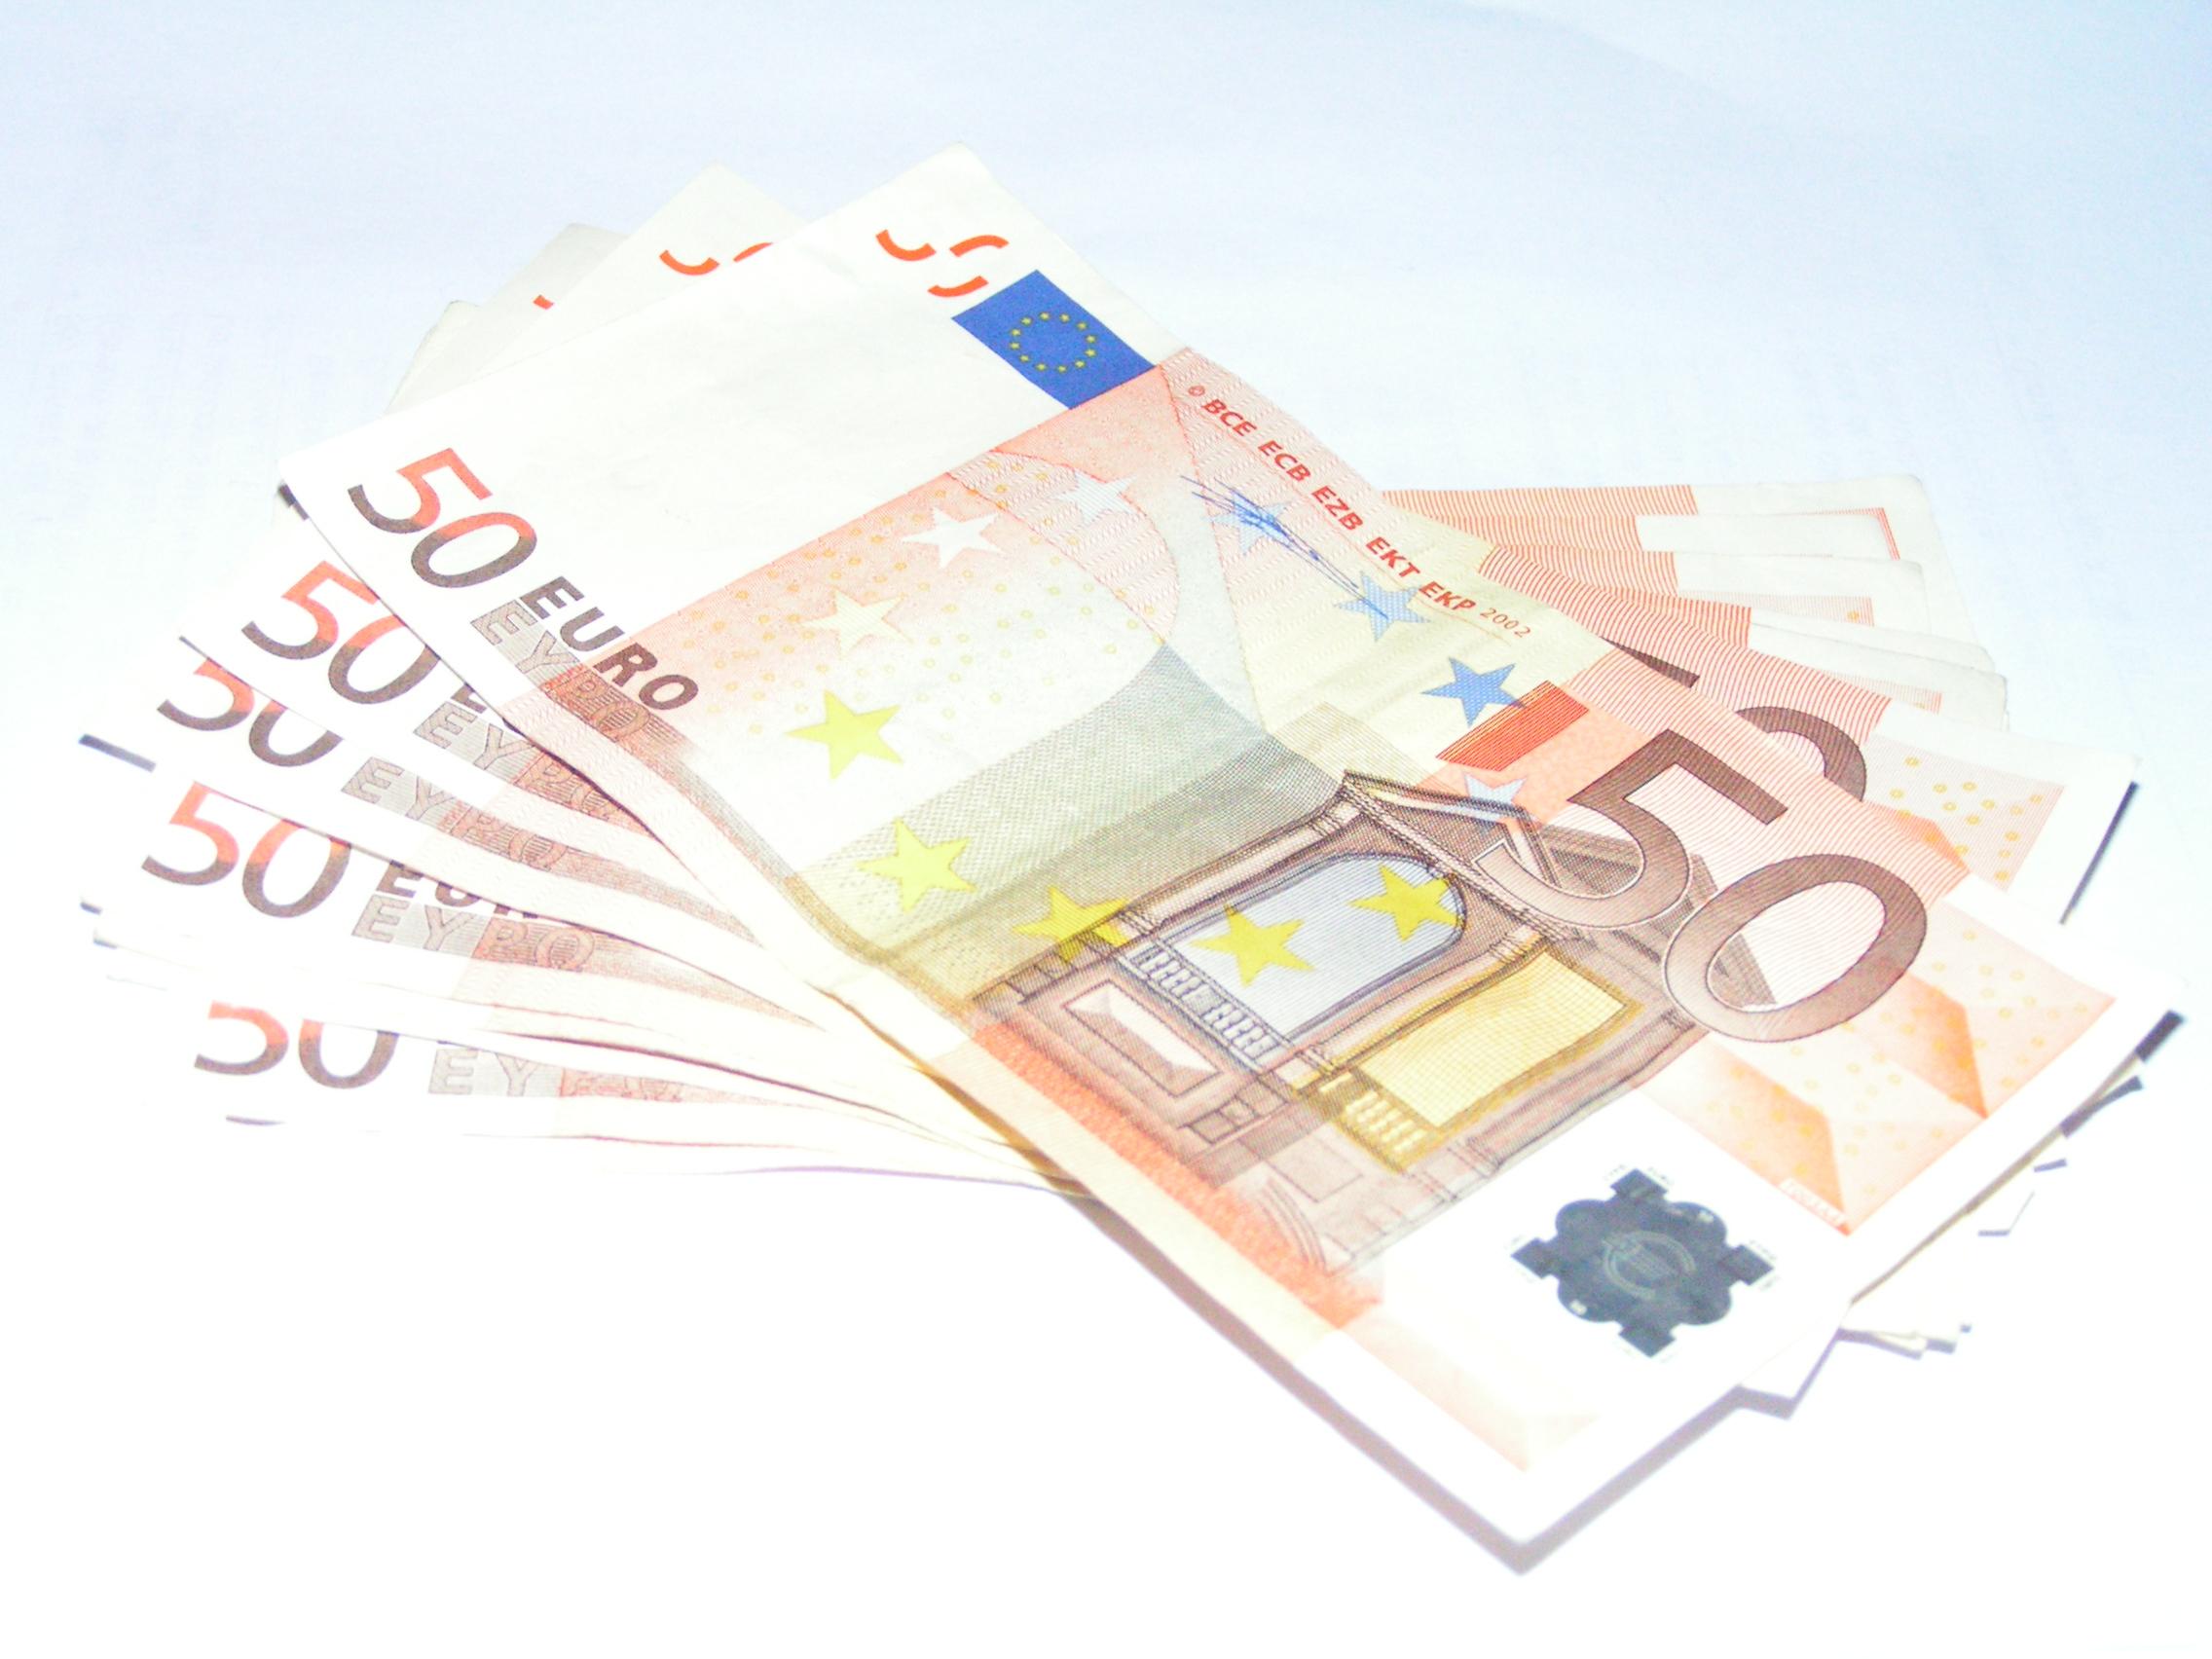 50 euro schein pictures to pin on pinterest